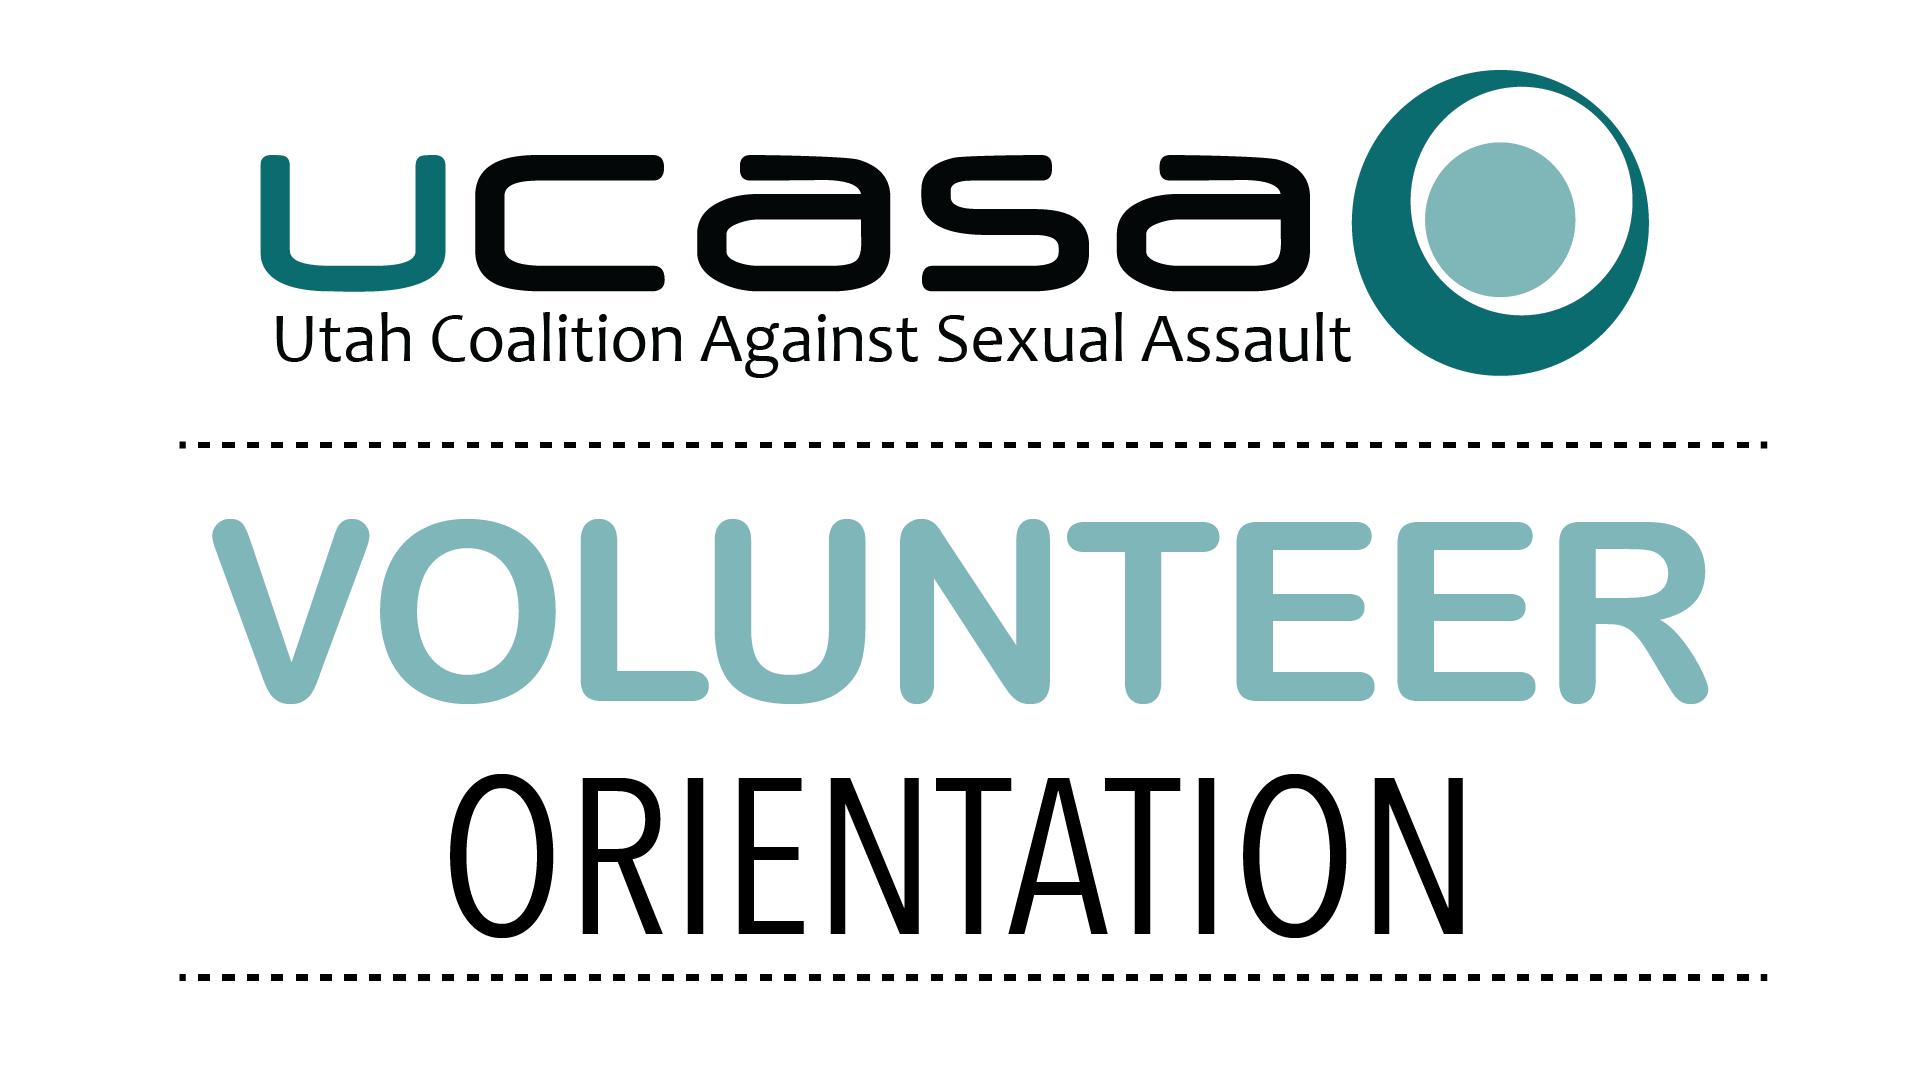 volunteerorientation-01.png